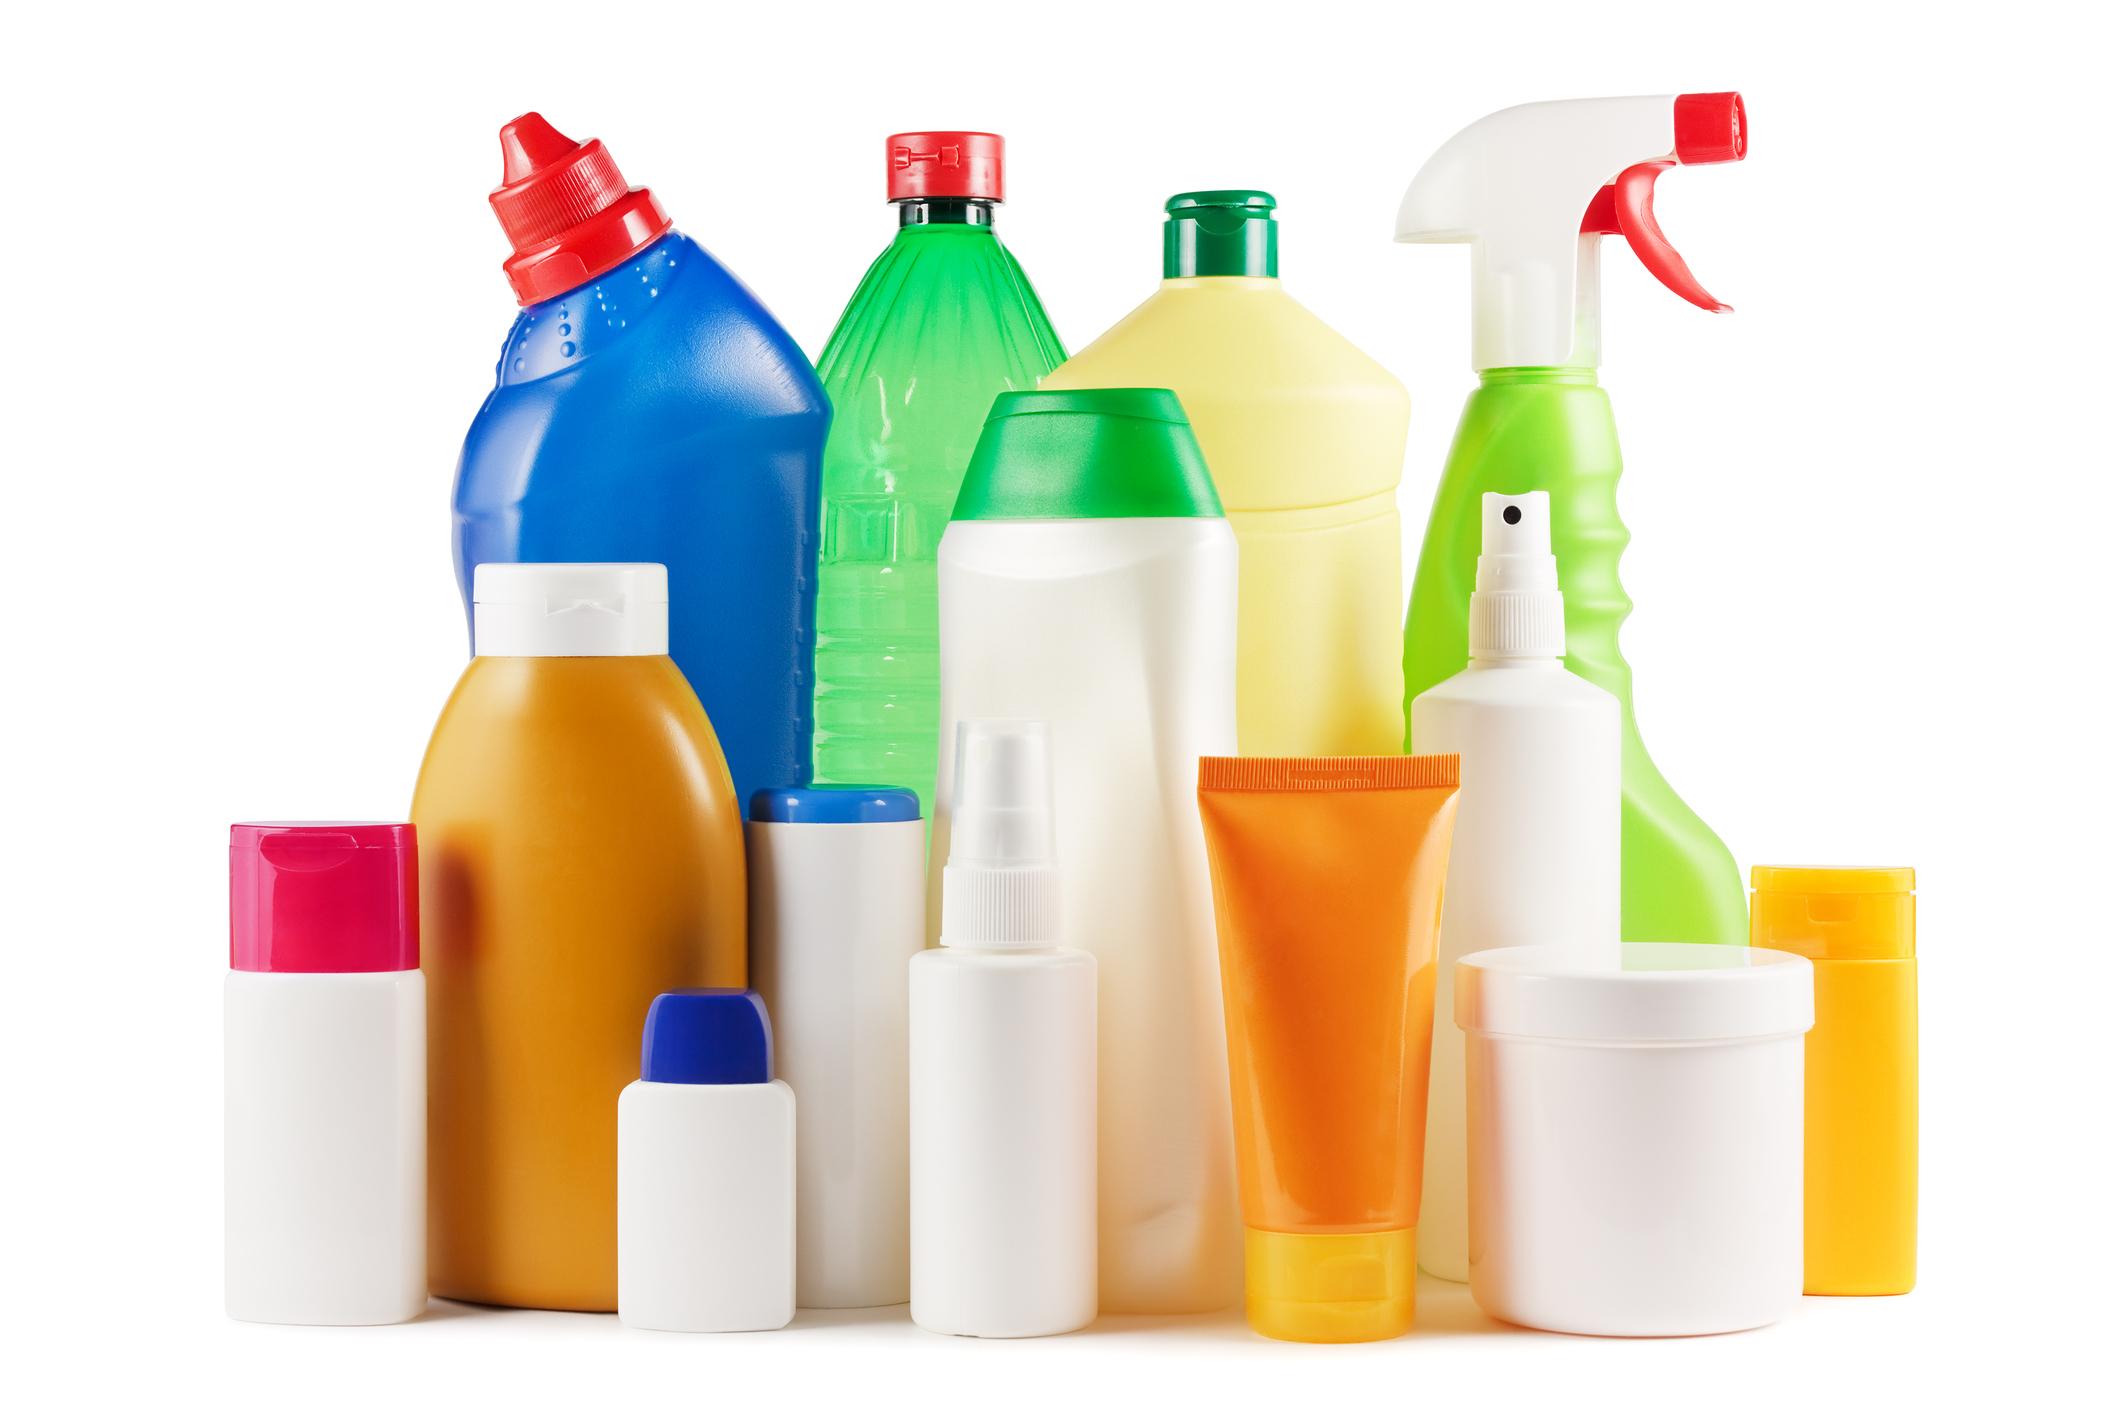 Various PET plastic bottles